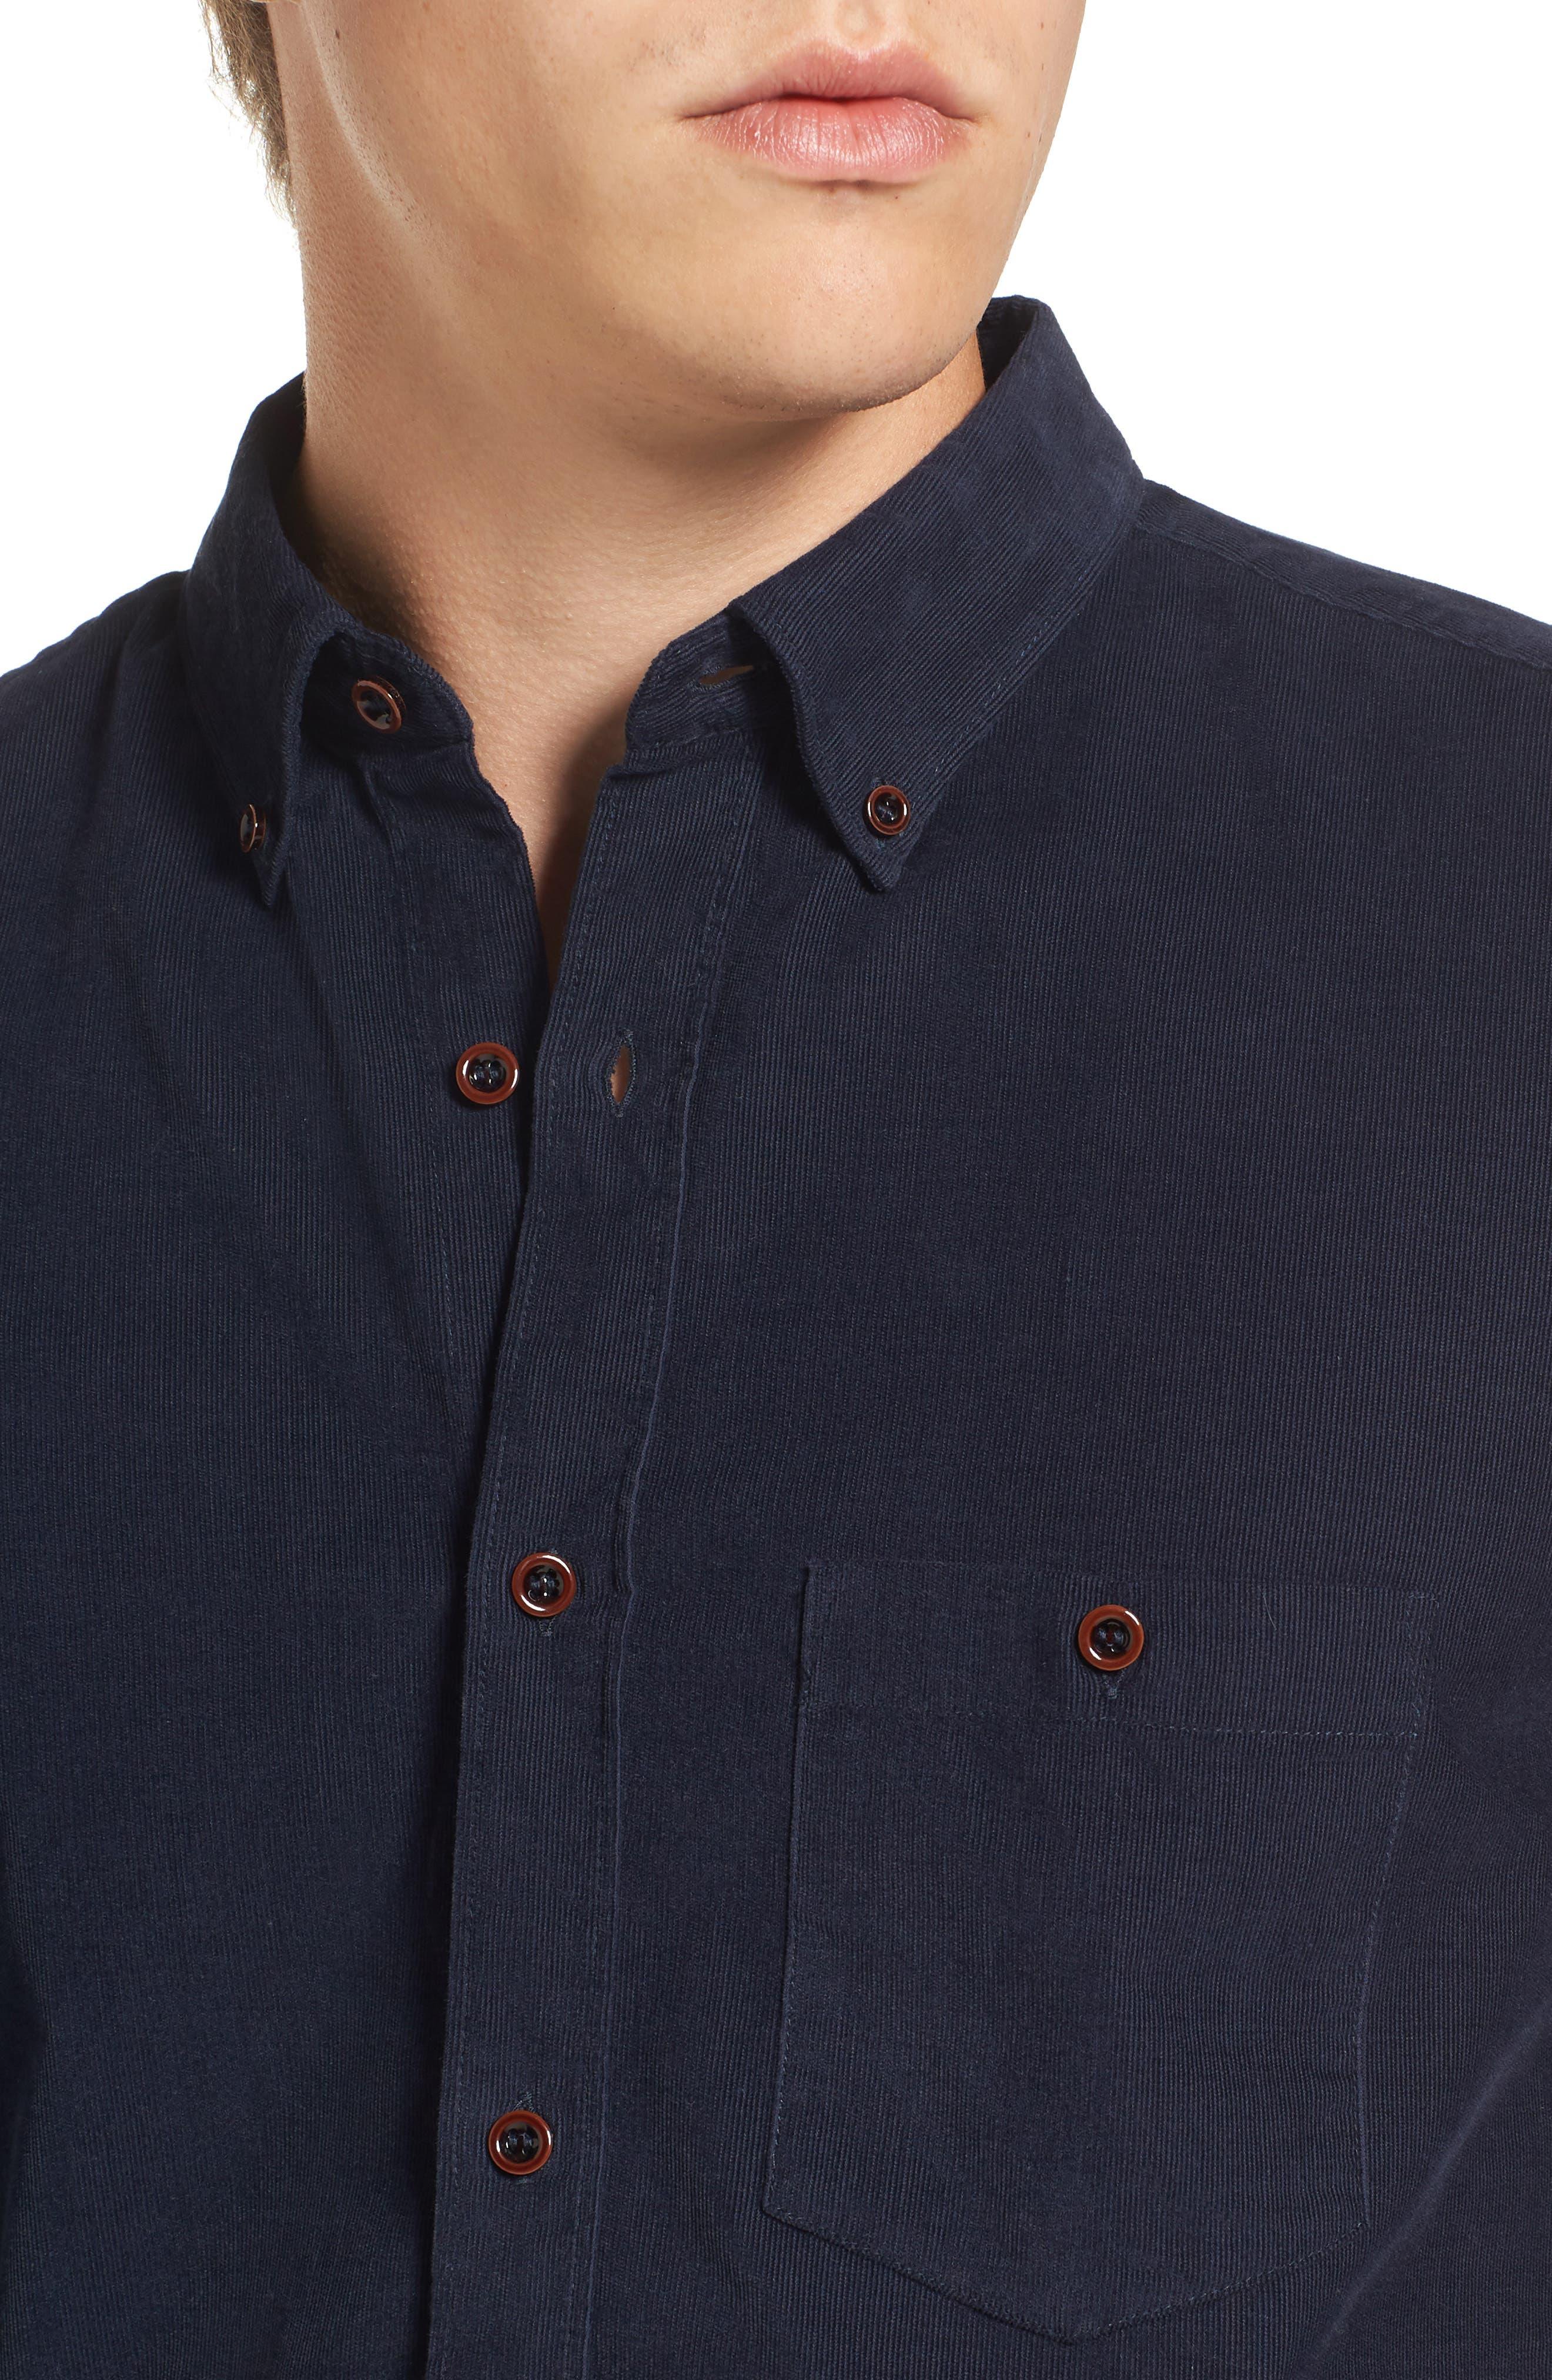 Corduroy Sport Shirt,                             Alternate thumbnail 4, color,                             Marine Blue